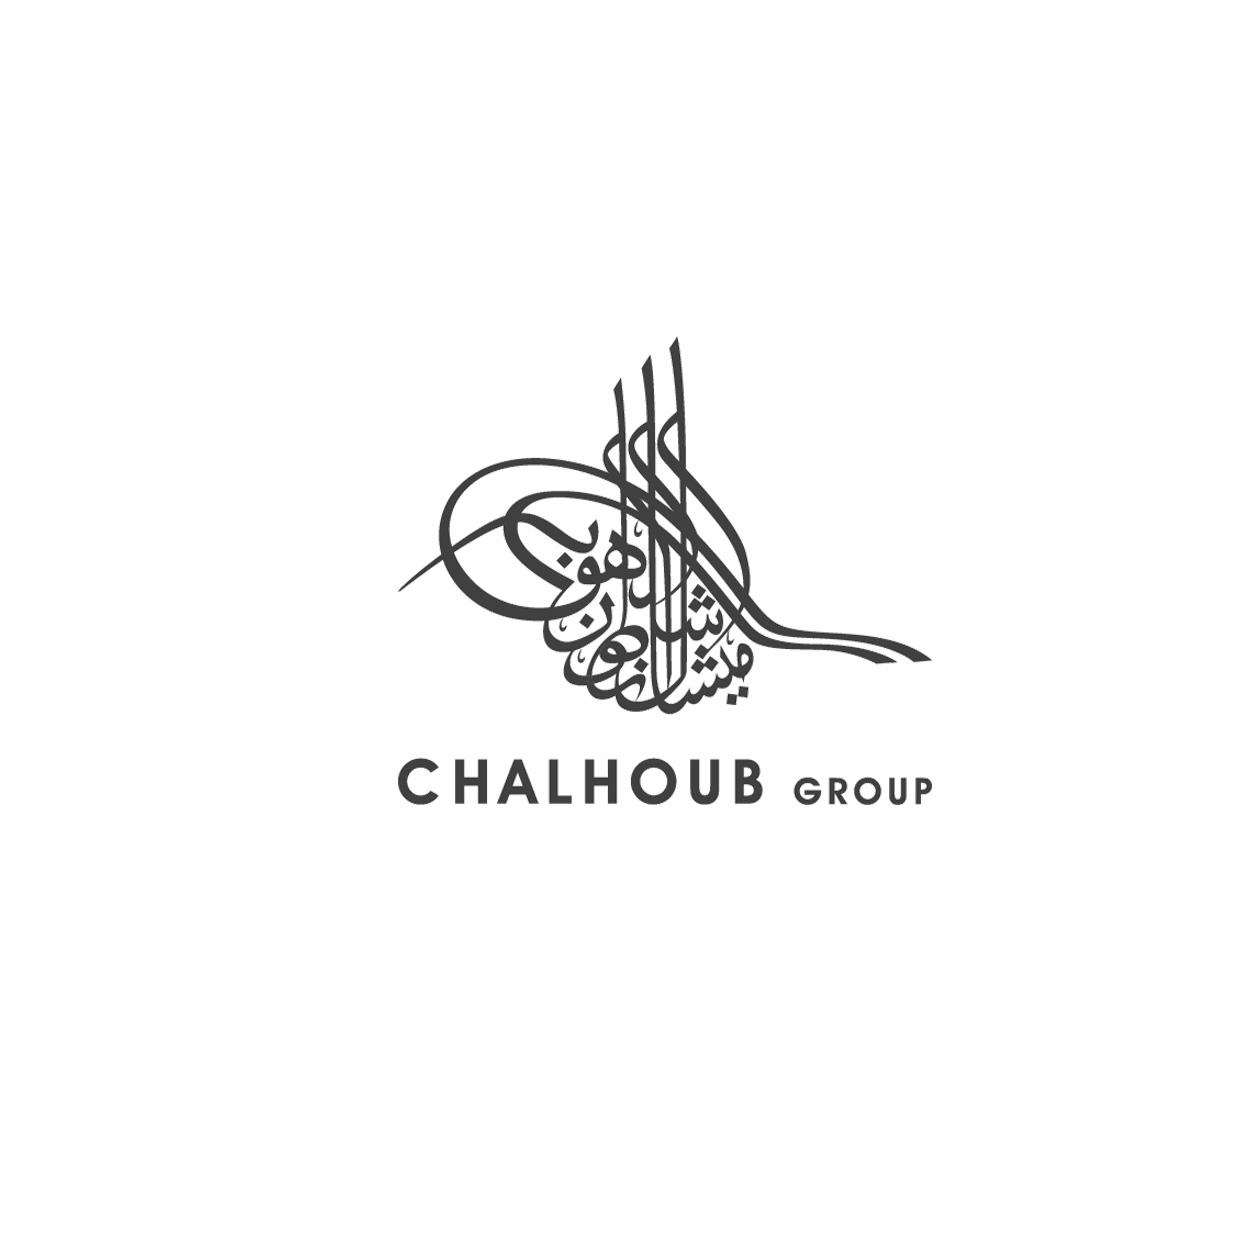 François Soulignac: Chalhoub Group Dubai - Campaign China - MADJOR Labbrand Shanghai